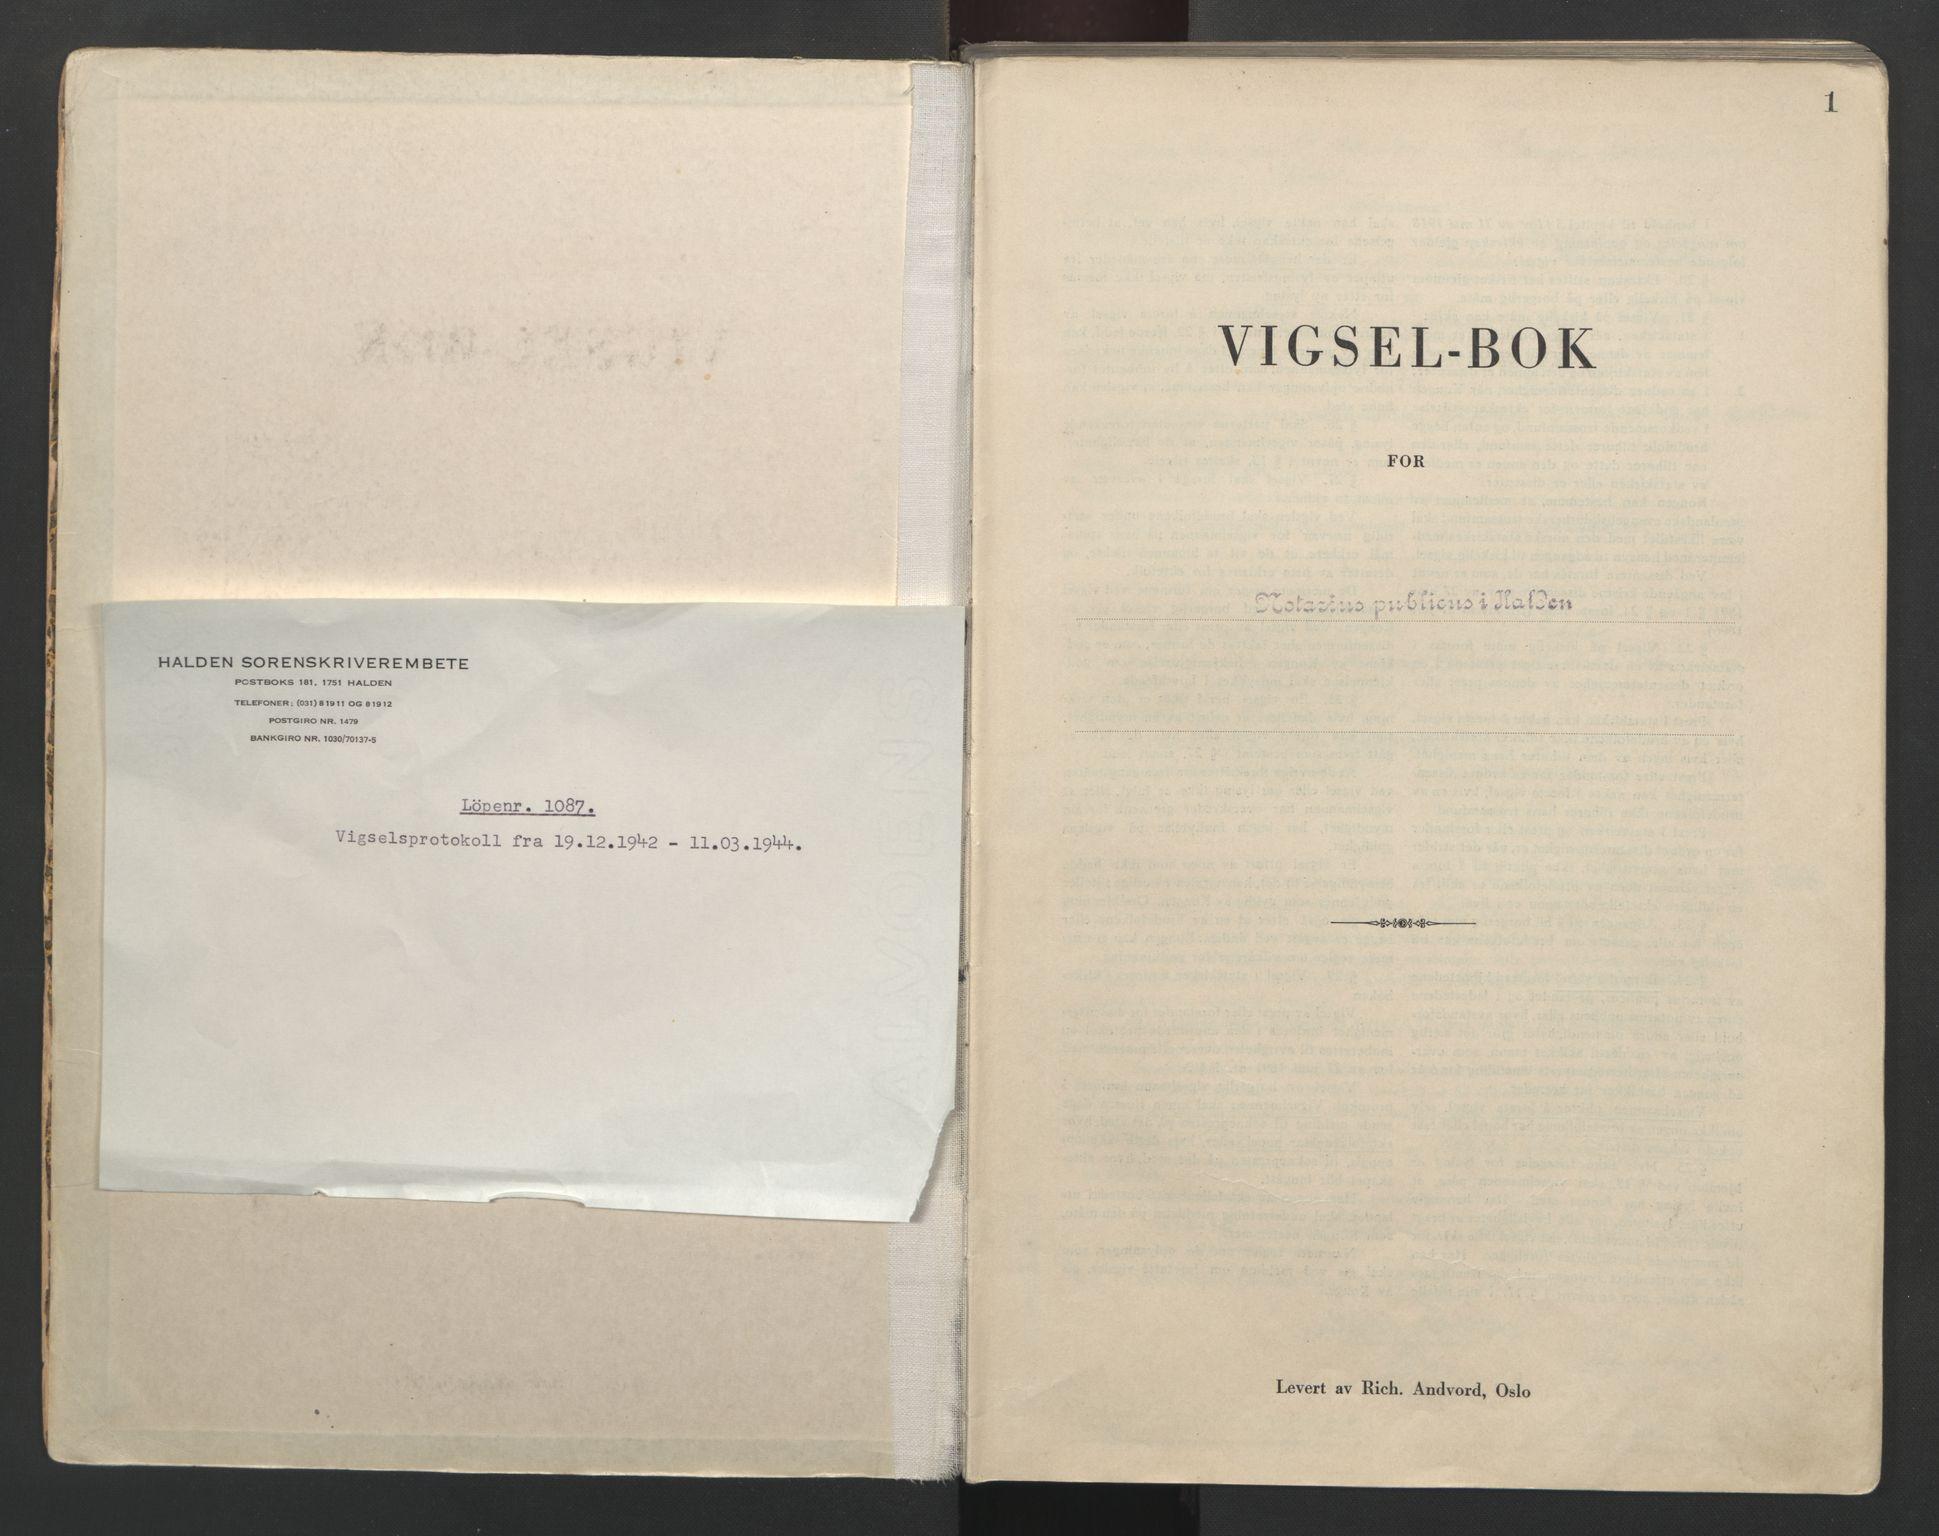 SAO, Idd og Marker sorenskriveri, L/Lc/L0001: Vigselsbøker, 1942-1944, s. 1